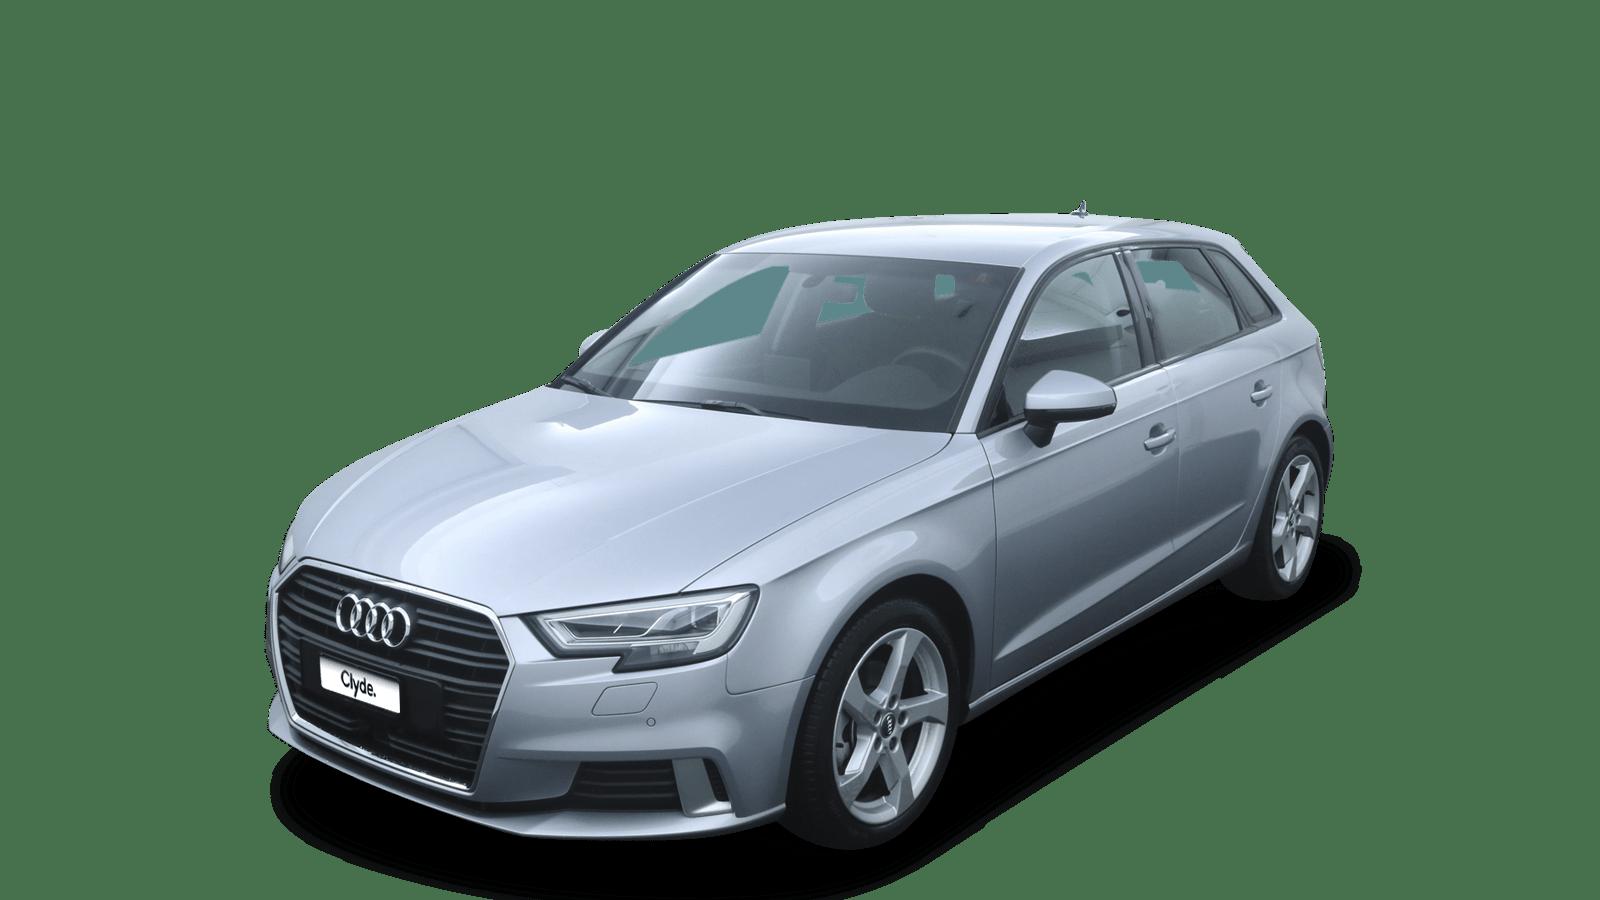 Audi A3 Sportback Silver front - Clyde car subscription